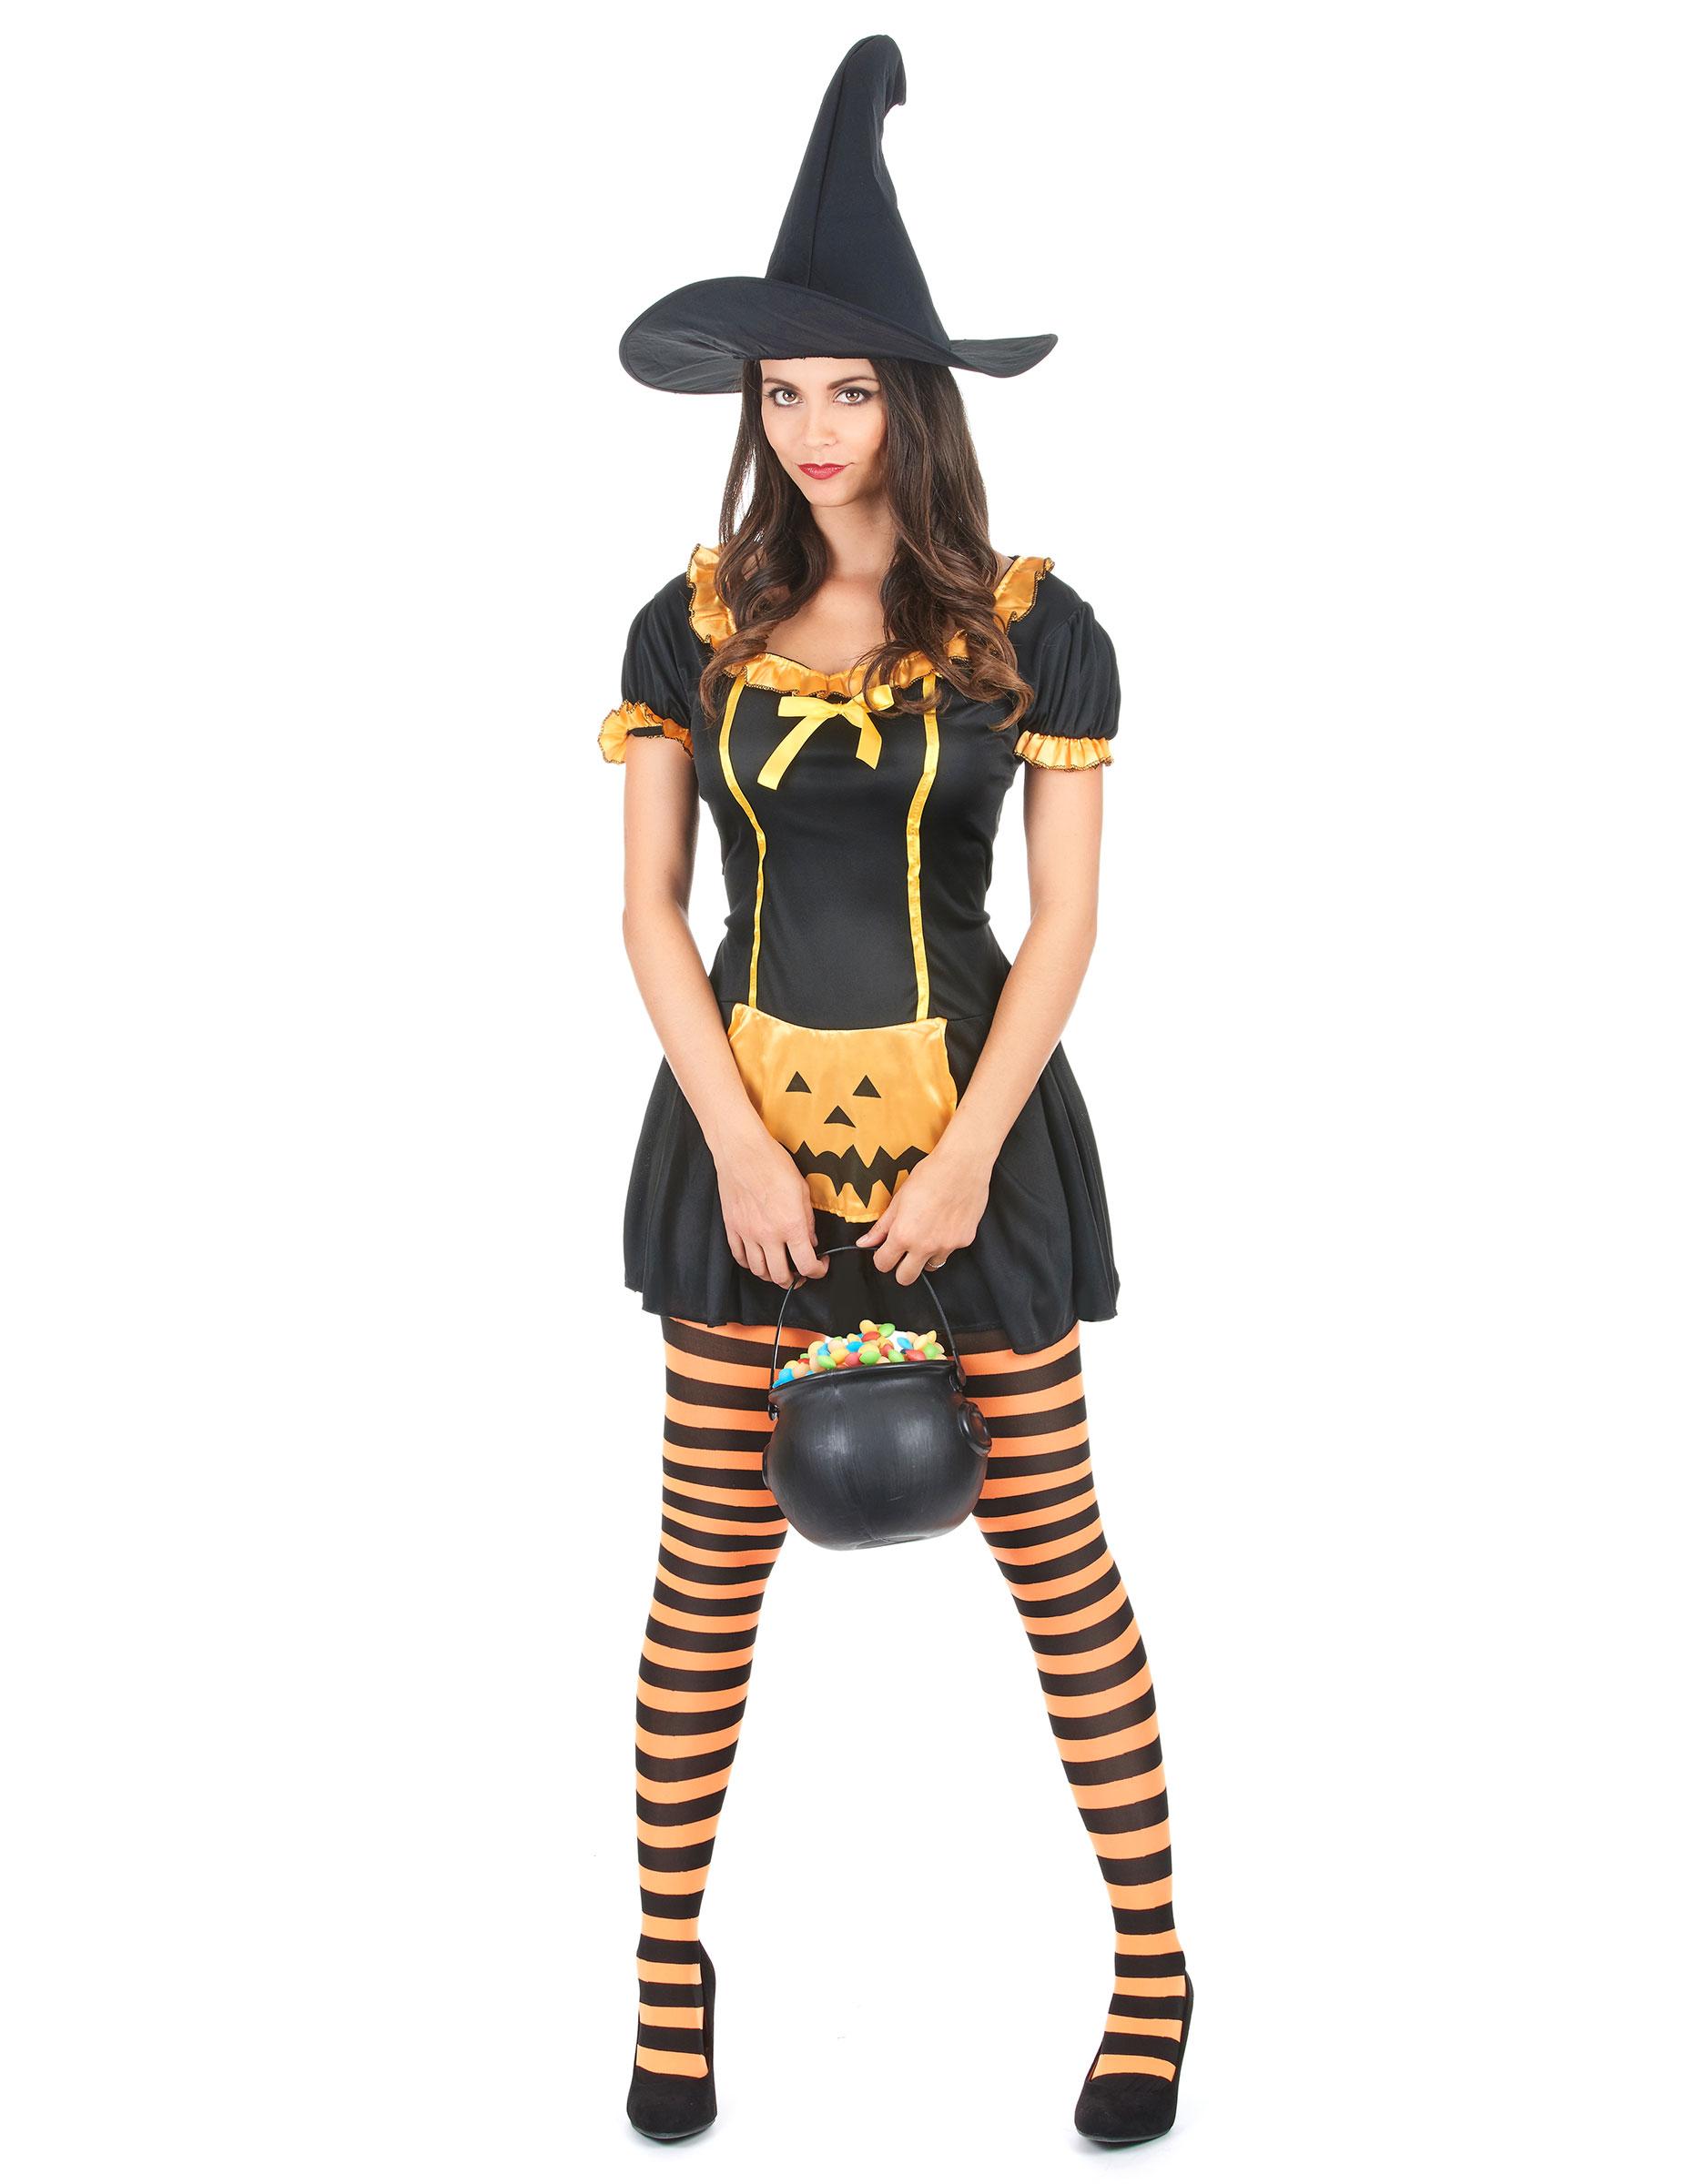 Halloween Pumpkin witch costume for women